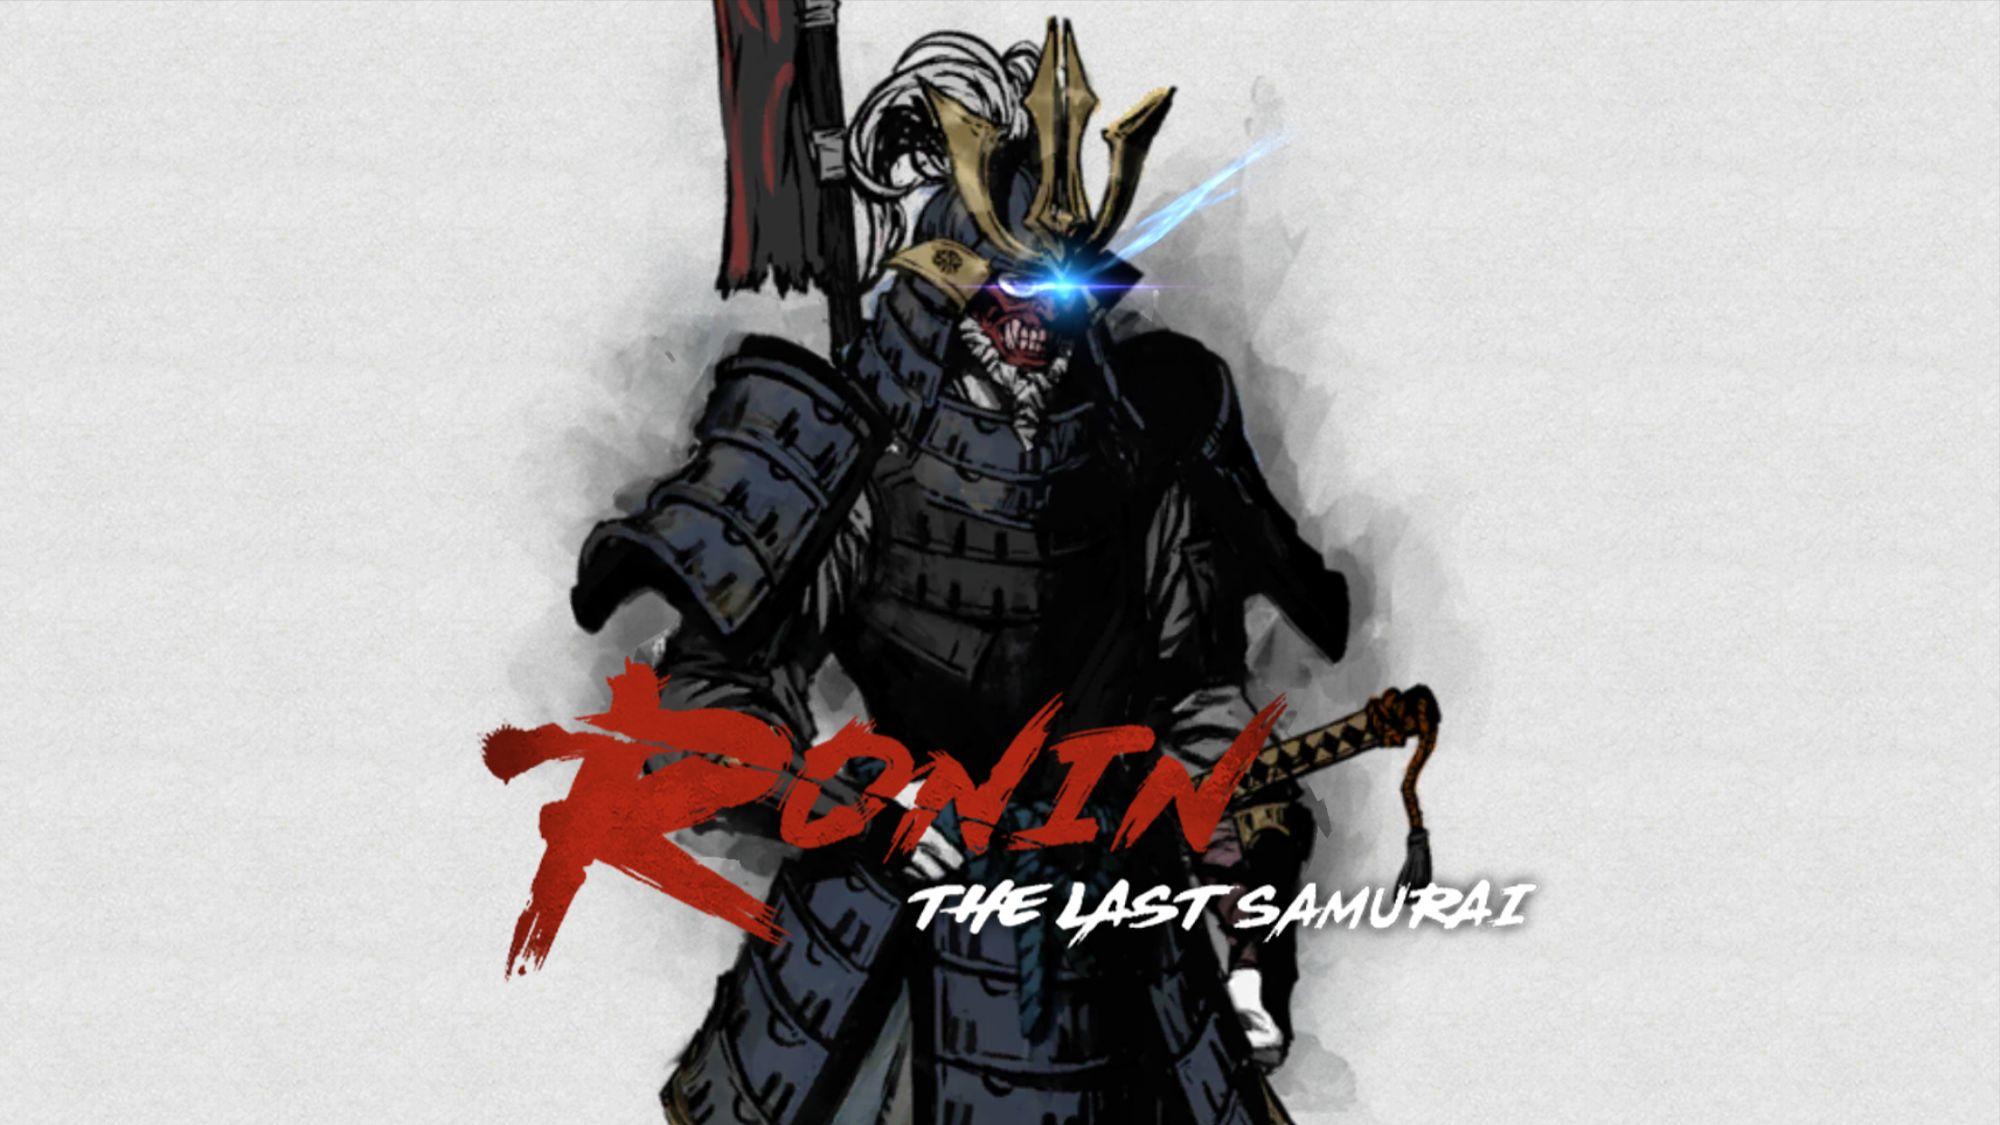 Ronin: The Last Samurai スクリーンショット1